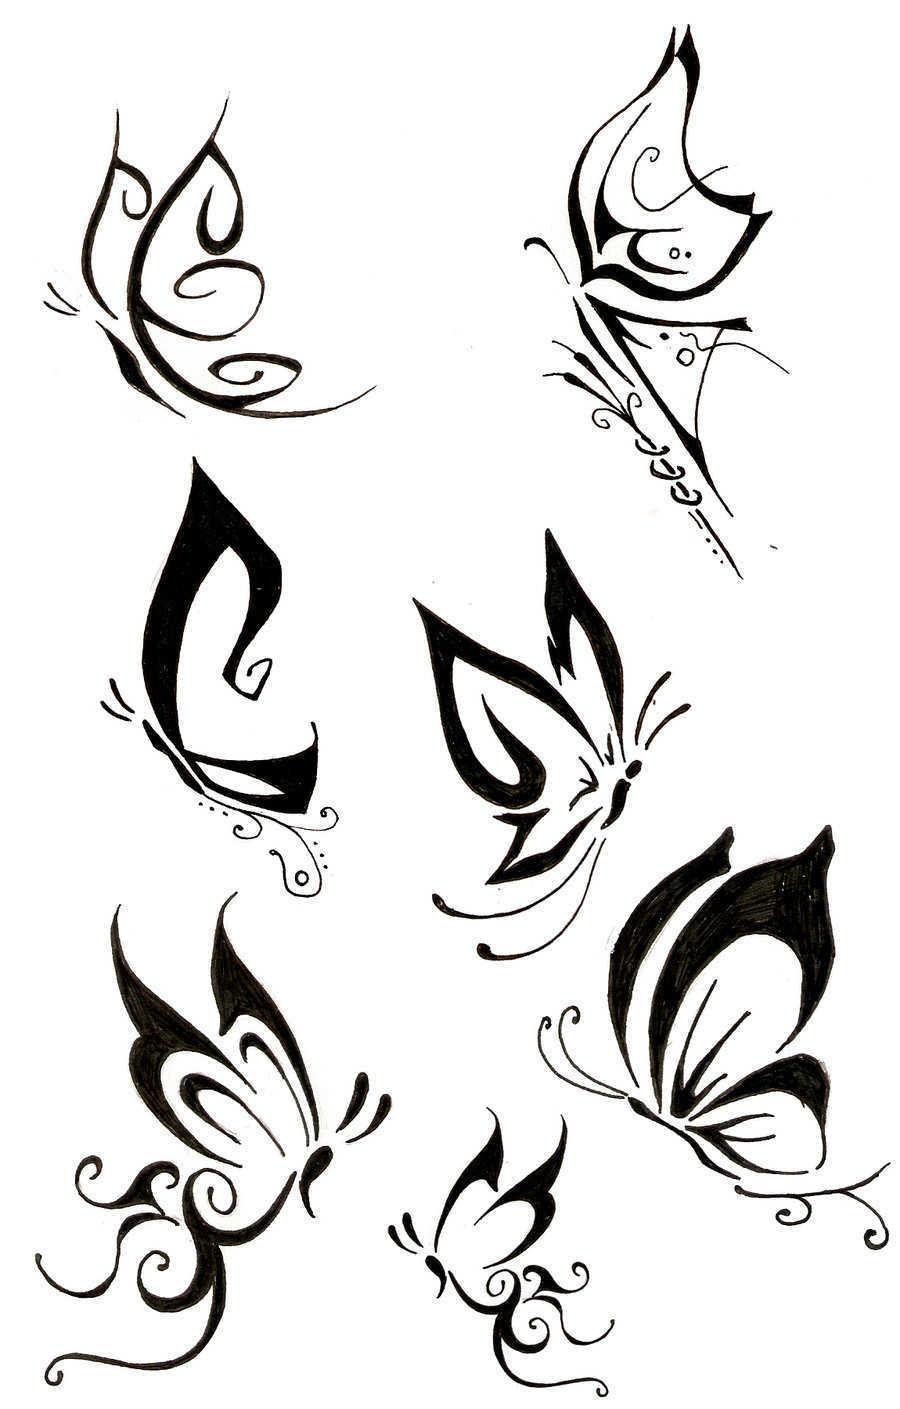 طرح خام تاتو 45+ Tribal Butterfly Tattoo Designs